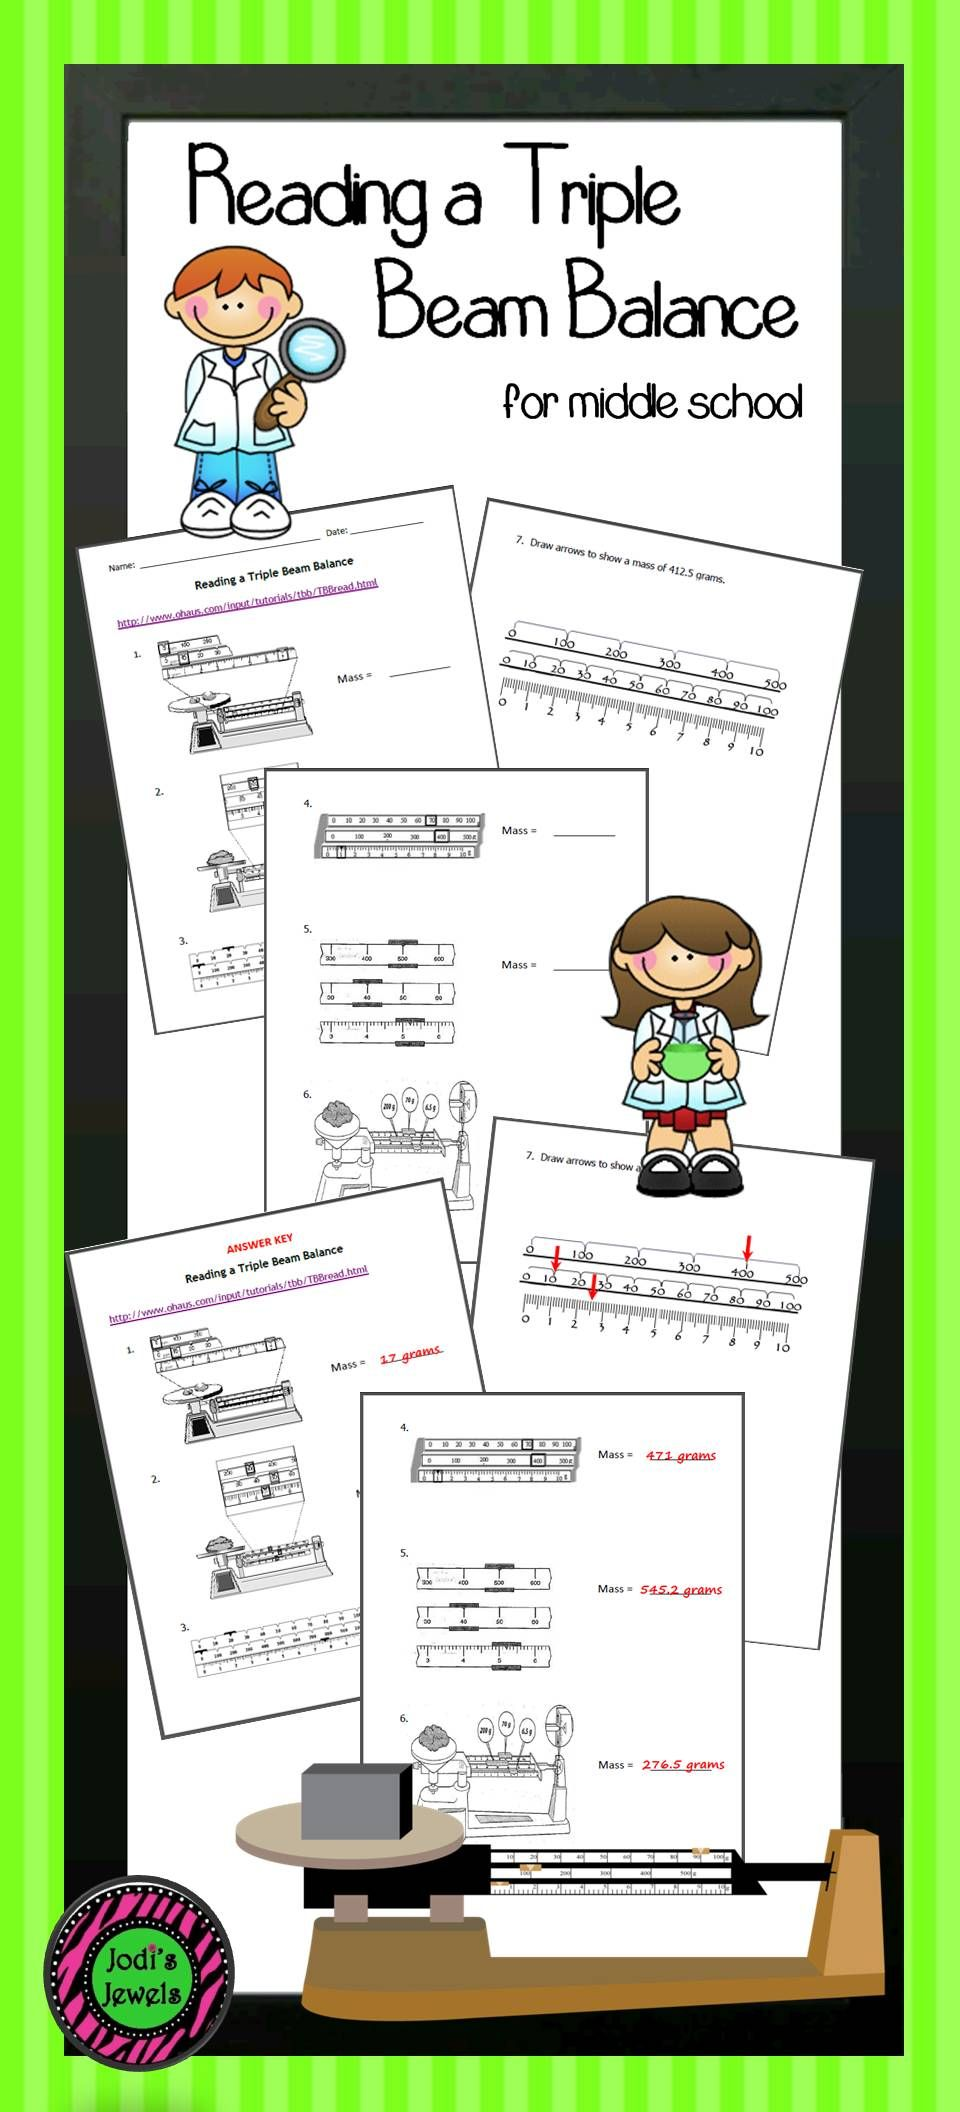 worksheet Reading A Triple Beam Balance Worksheet reading a triple beam balance worksheets and students